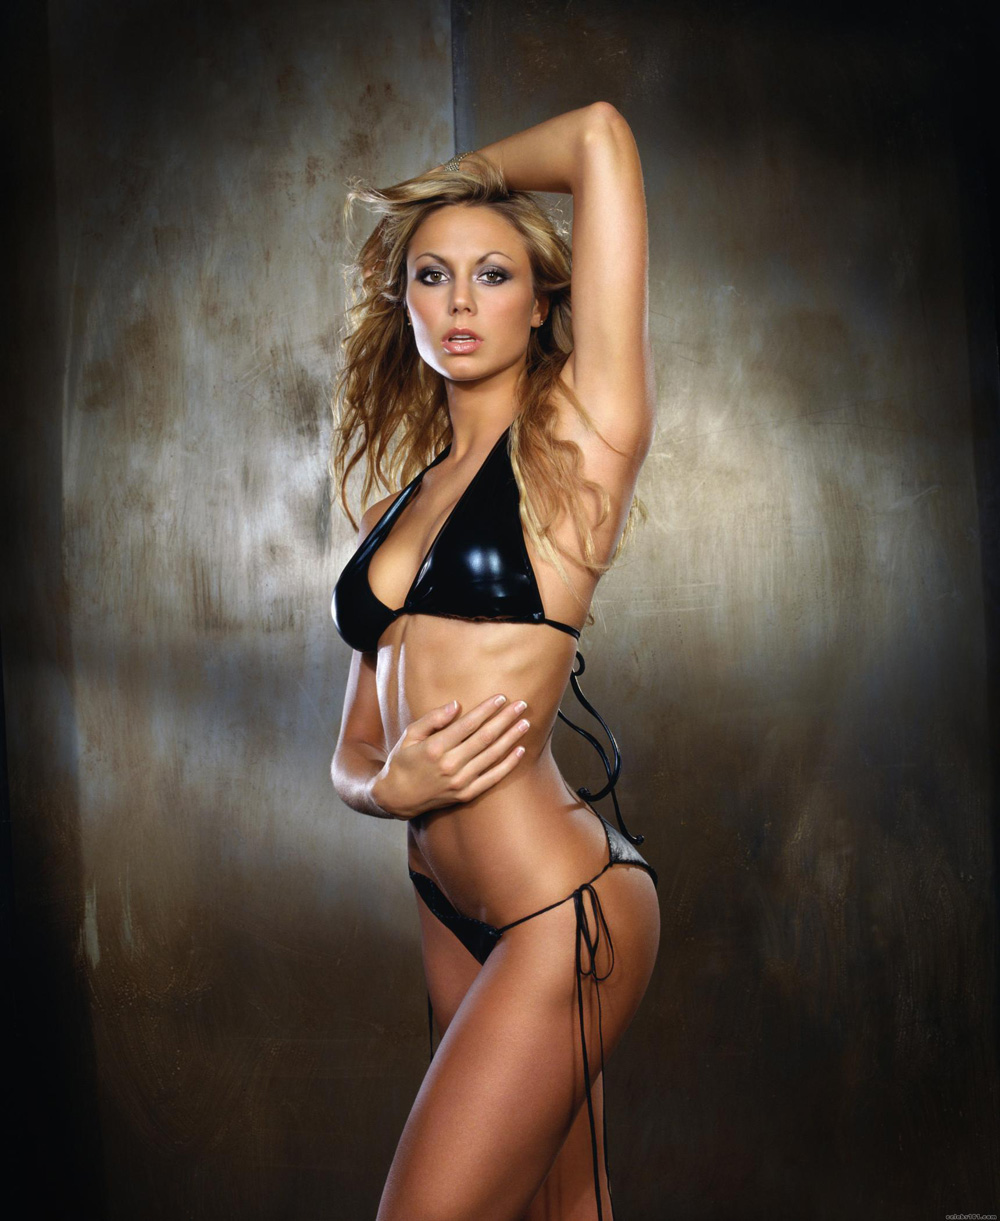 Stacy Keibler Hot Pics In Bikini | Hot Celebrity Photos ...